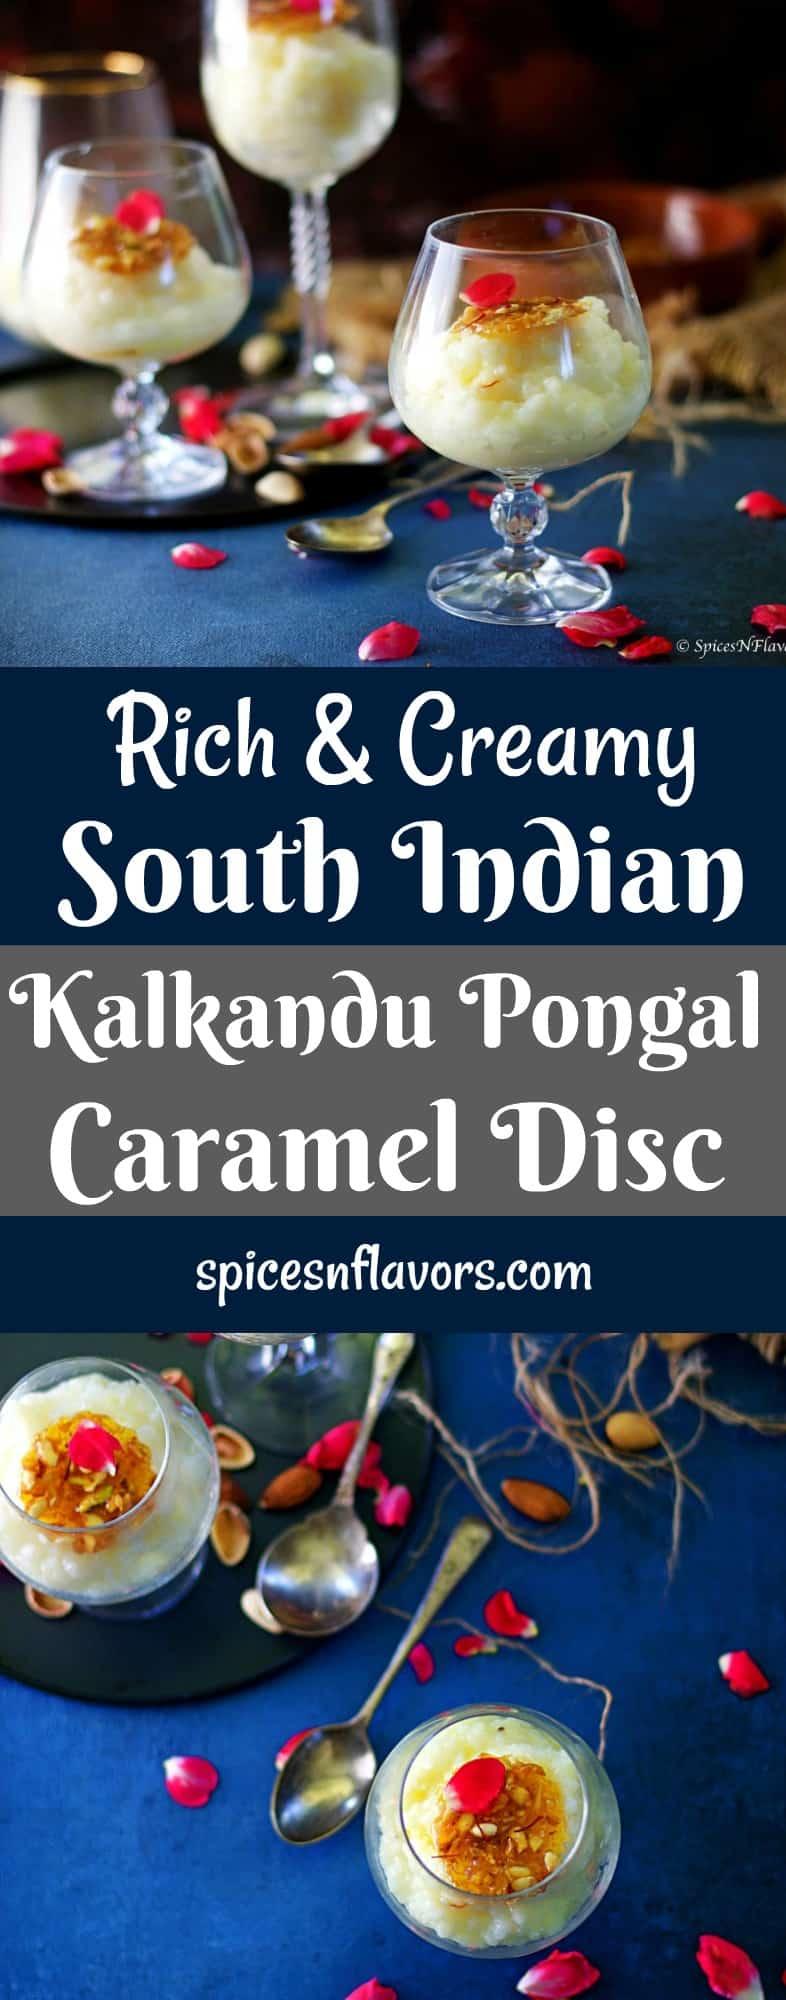 kalkandu pongal with caramel disc kalkandu pongal pongal sweet pongal indian festival recipes indian sweets traditional food authentic indian food indian sweet pongal recipes pongal photography